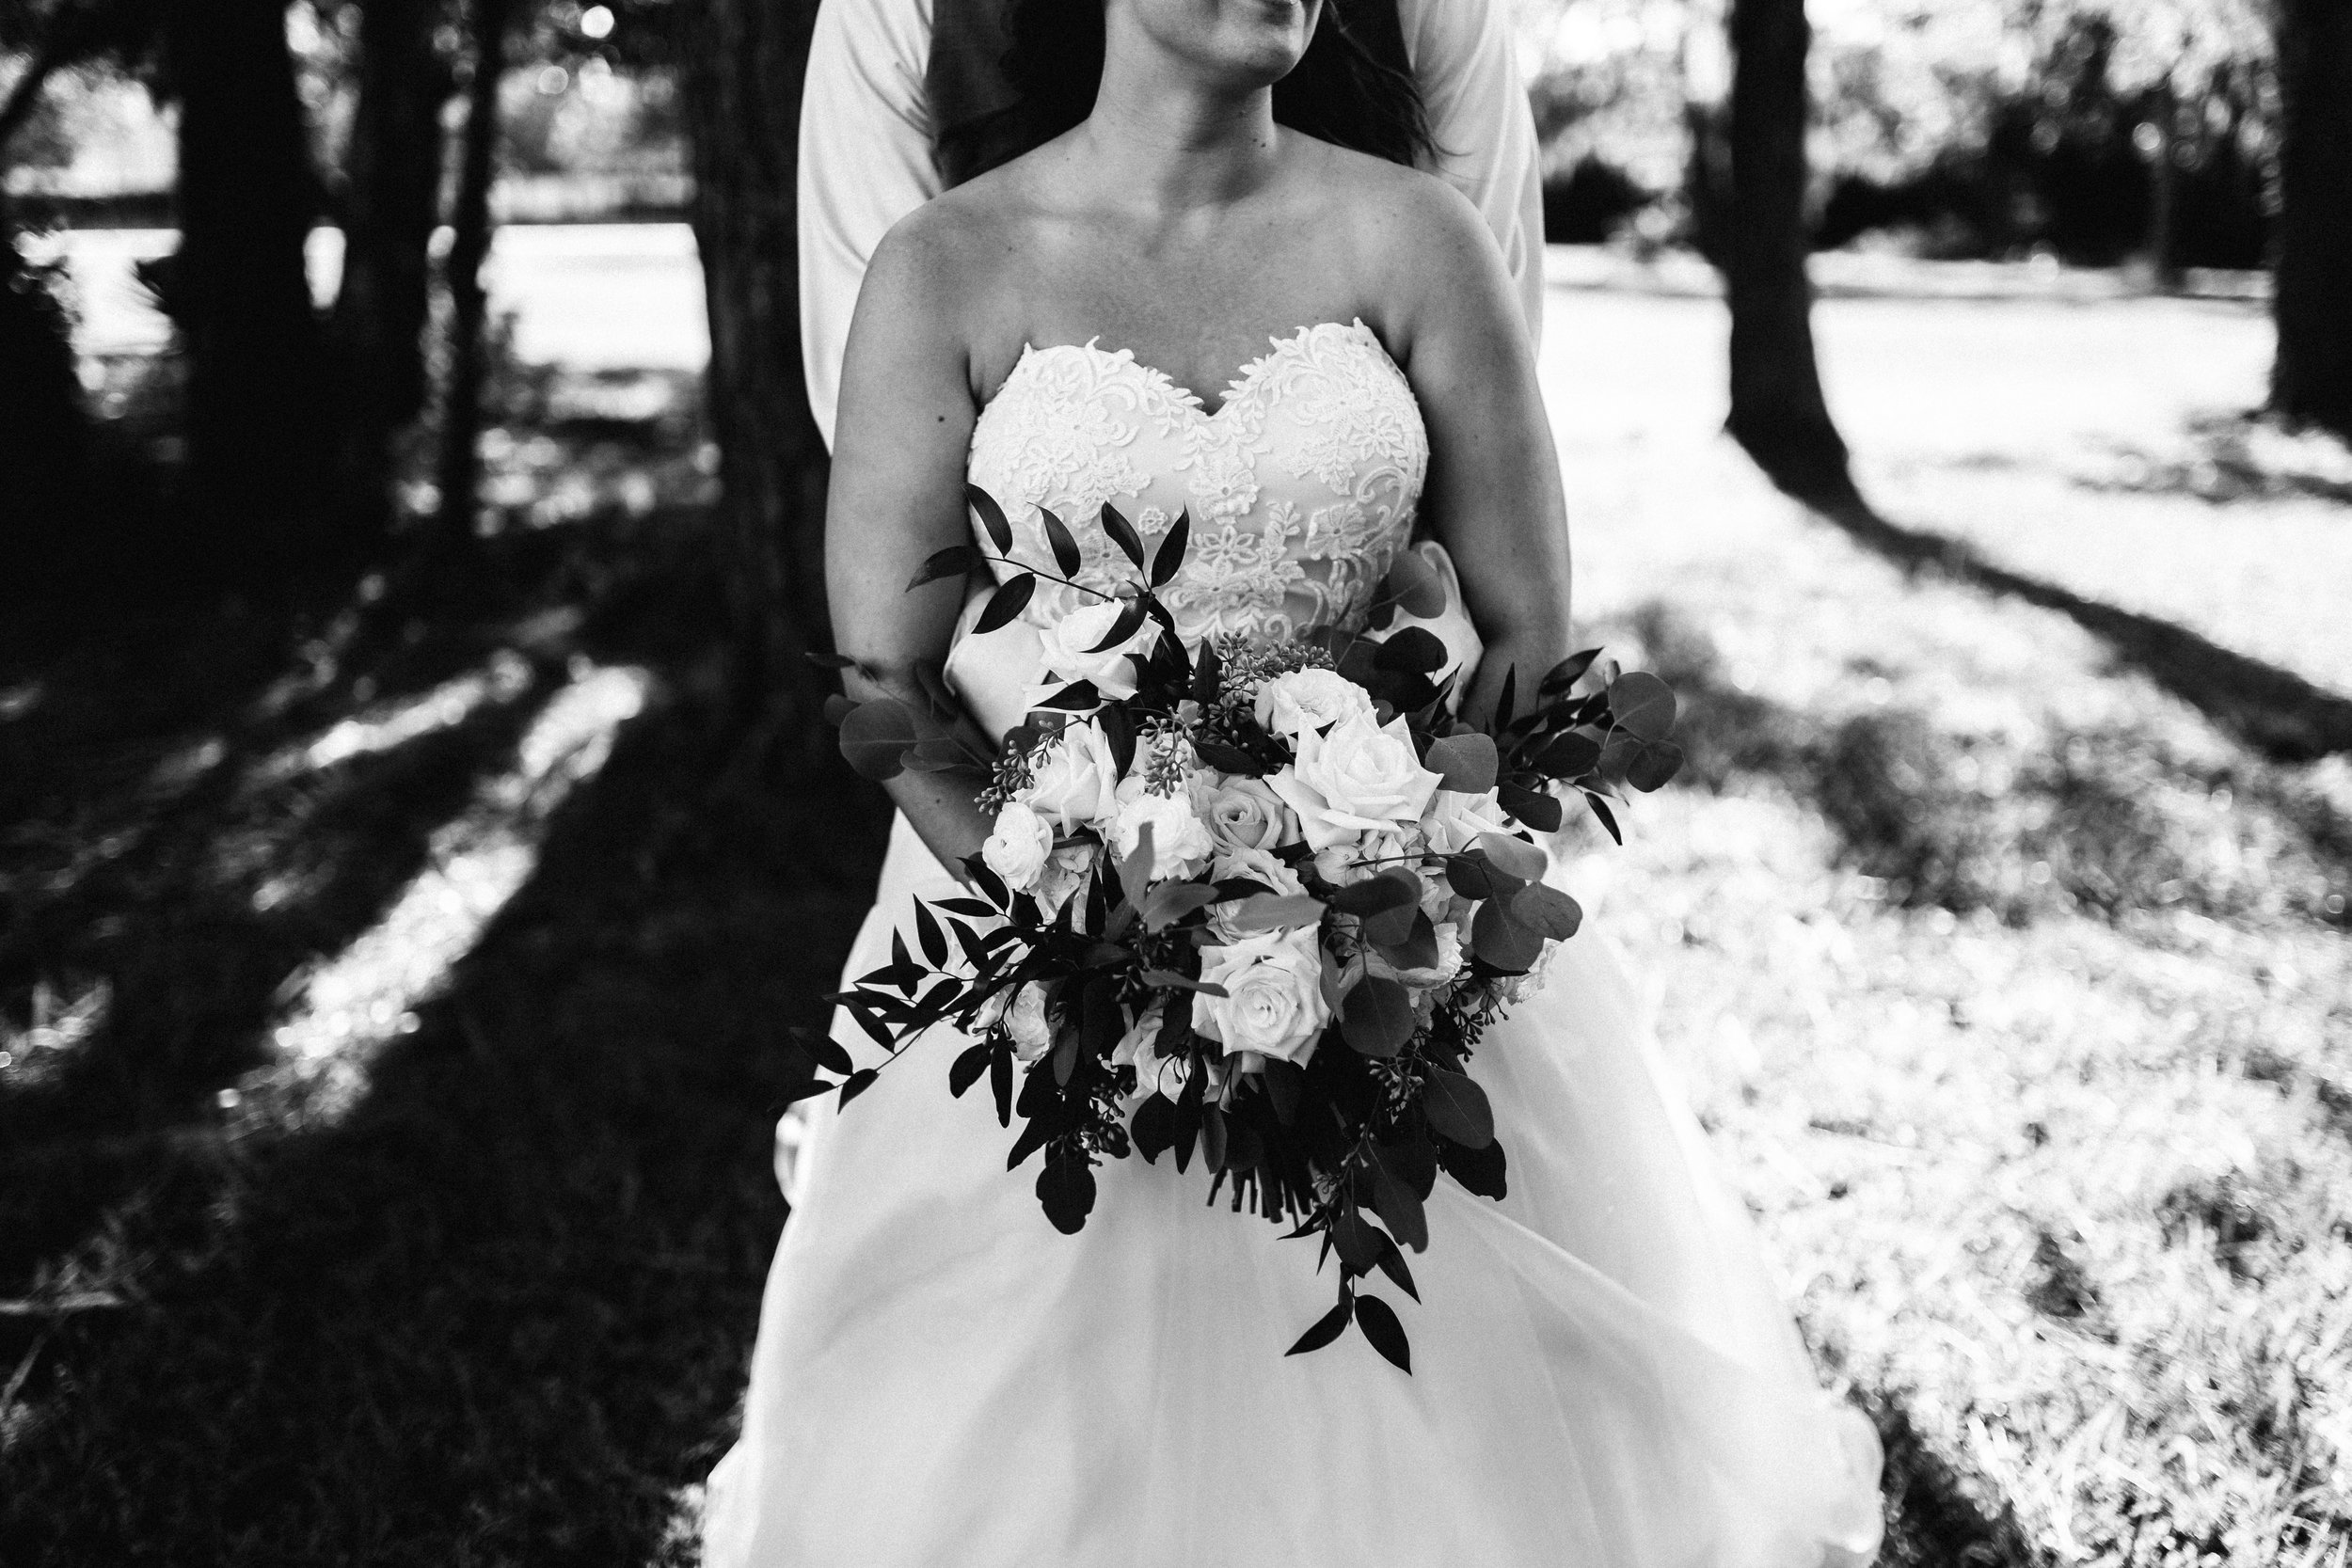 2017.10.14 Samantha and Matthew Crabtree Sarasota Wedding (328 of 708).jpg